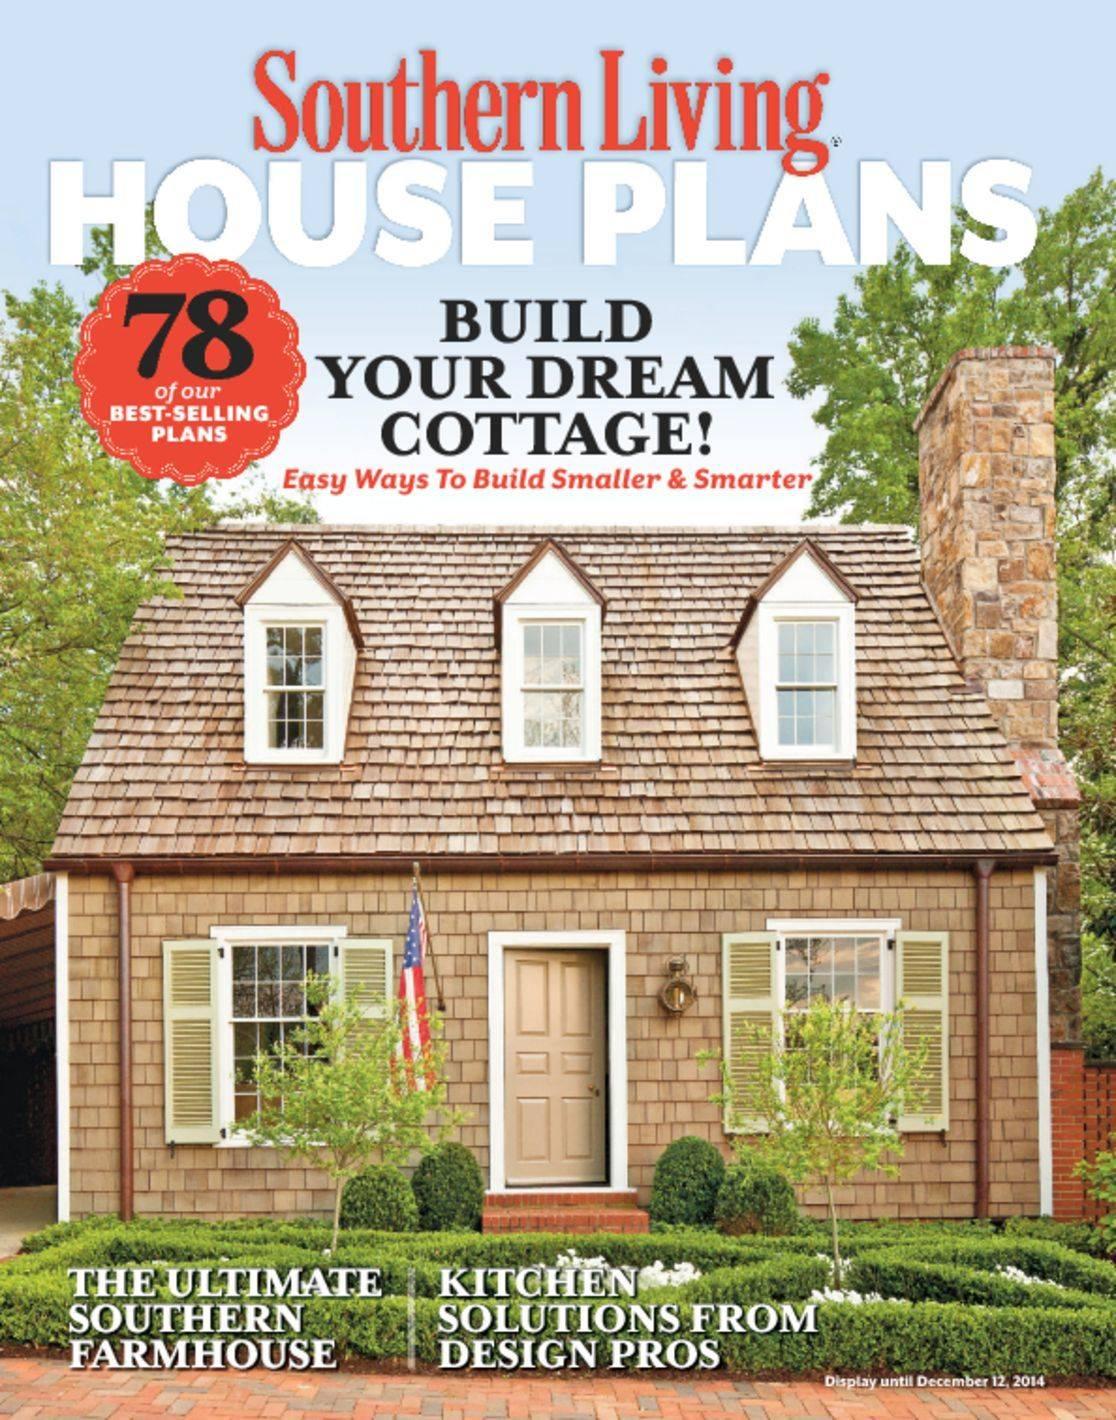 Southern Living House Plans Magazine Digital